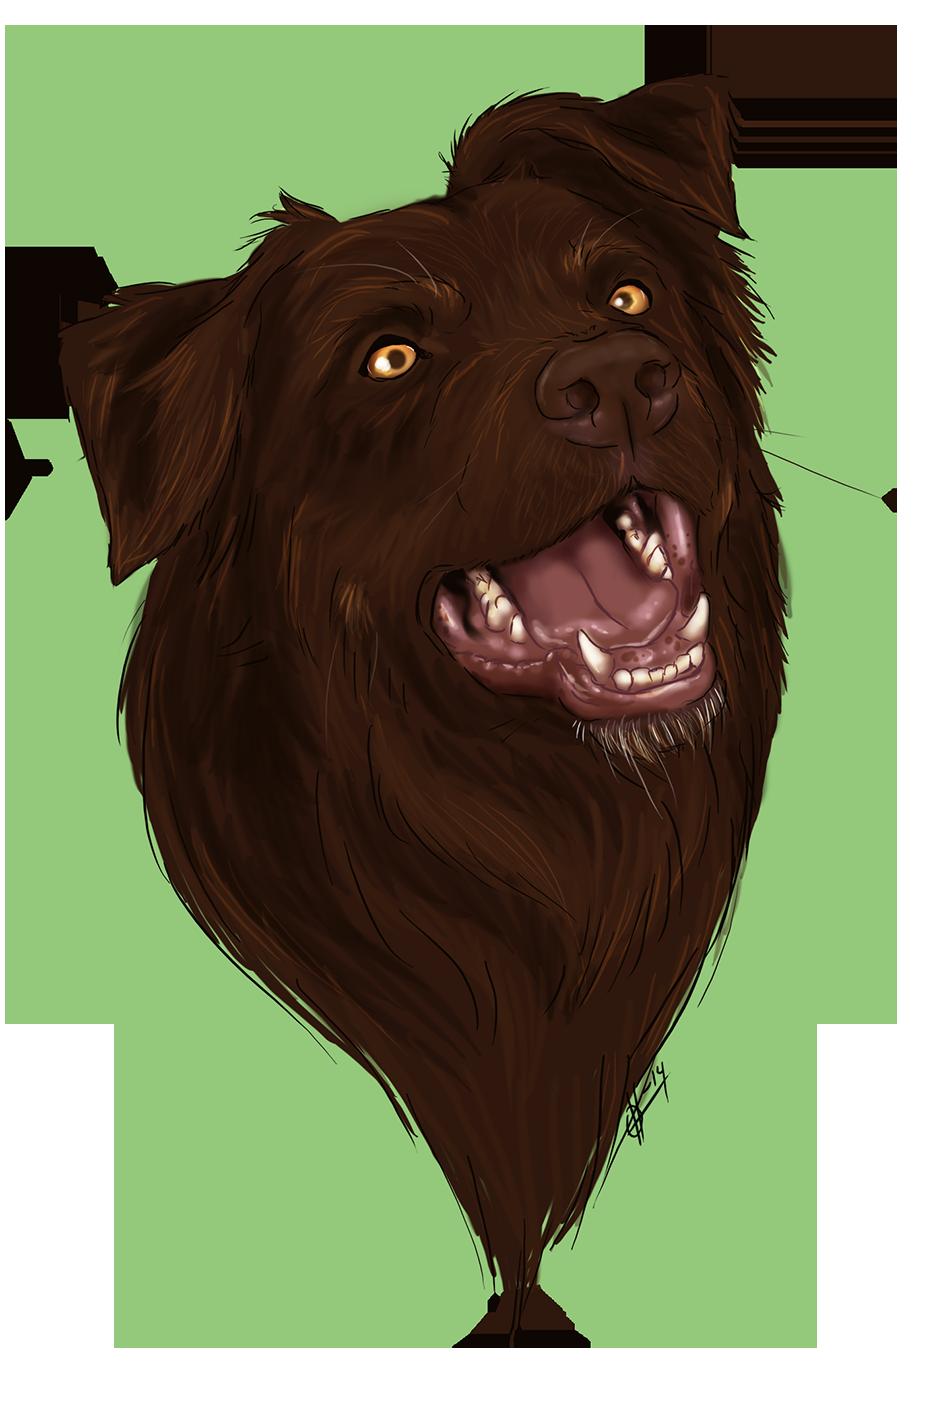 Loki the doge